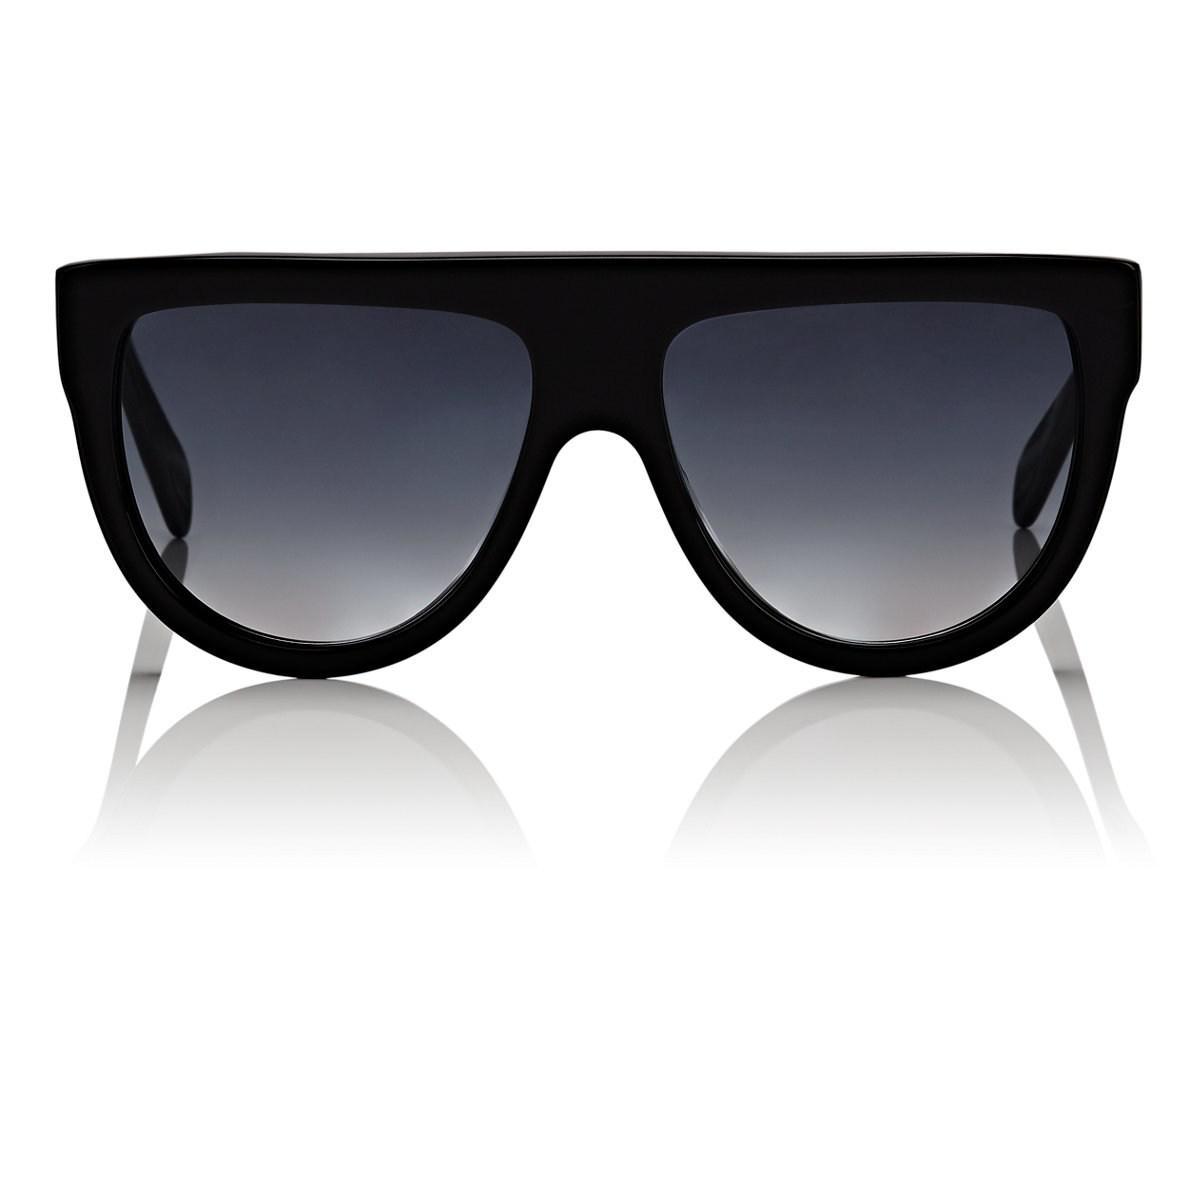 4255a4b7fb4 Céline Aviator Sunglasses in Black - Lyst